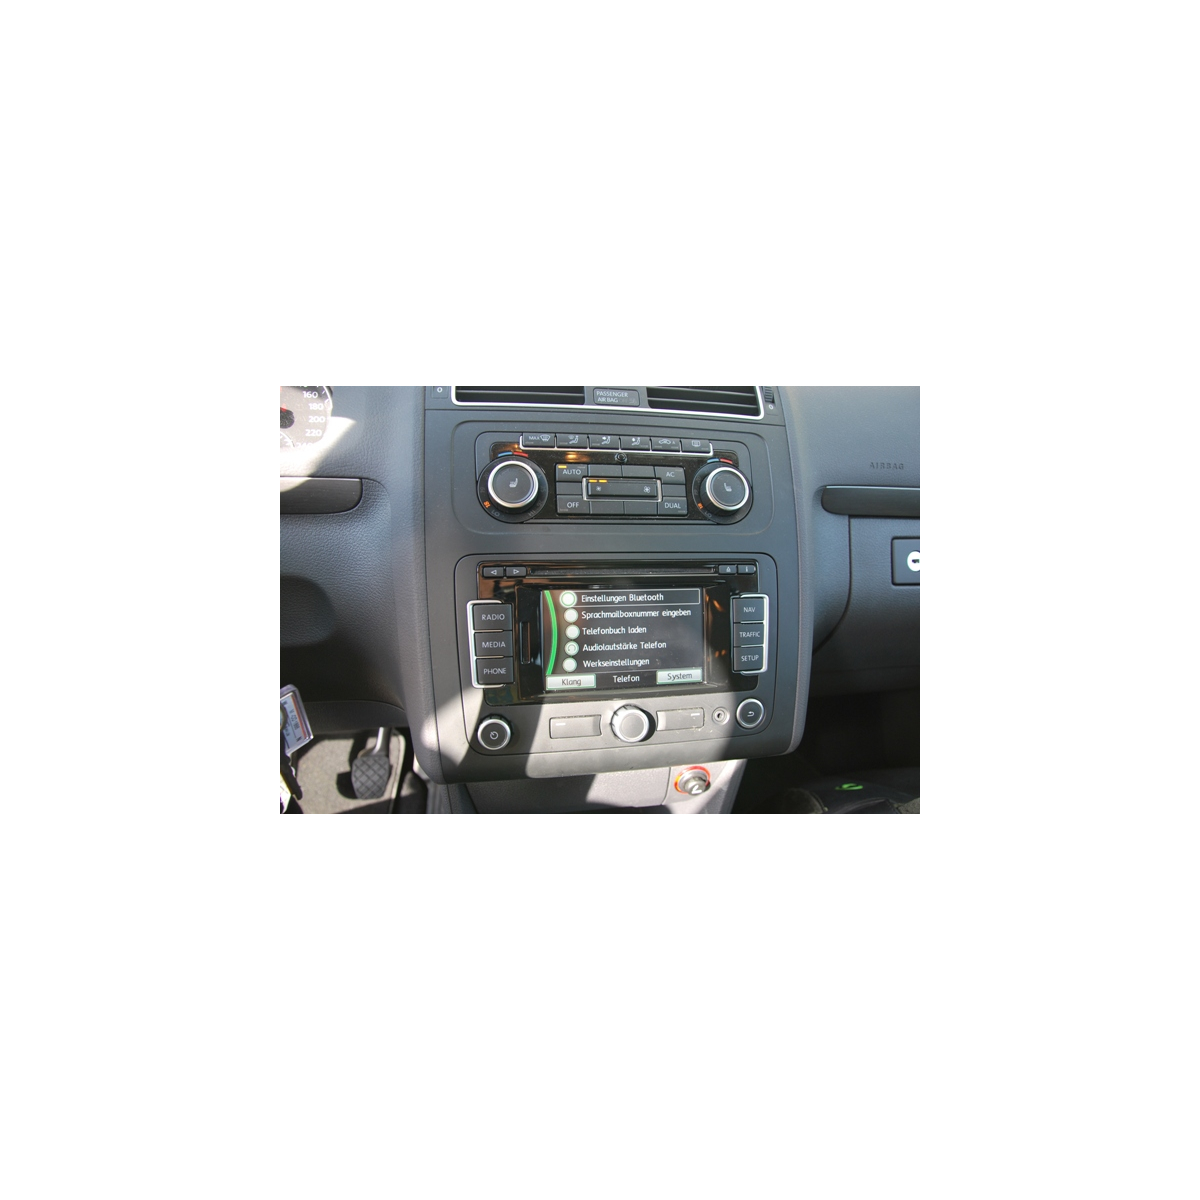 Vw navigationssystem rns 315  RNS 315 radio navigation